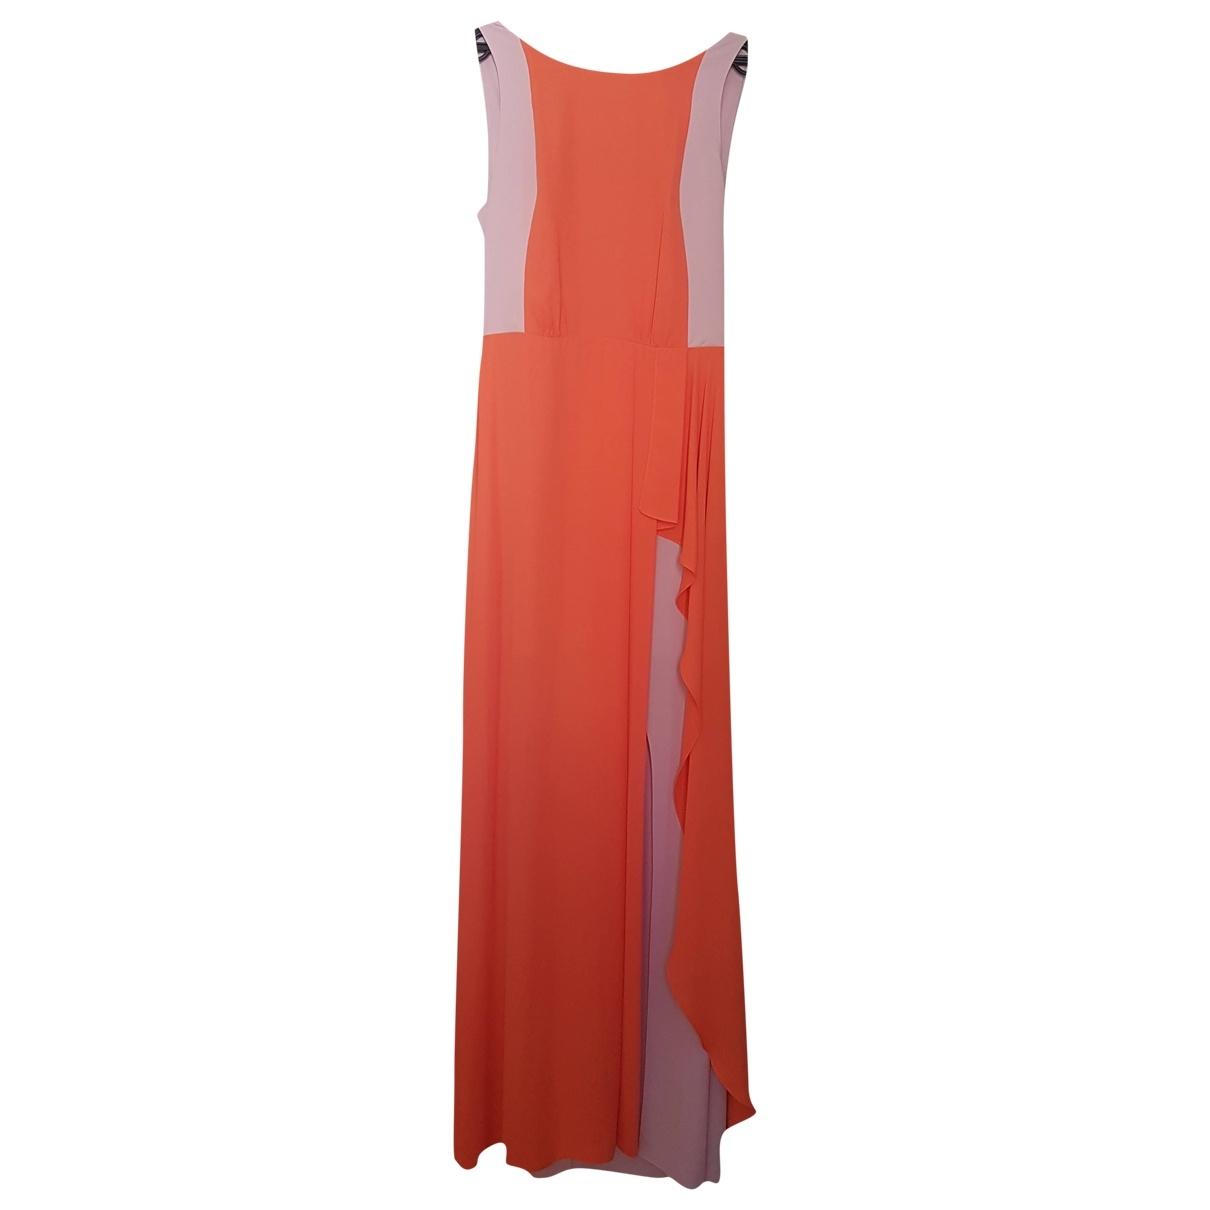 Bcbg Max Azria \N Orange dress for Women 2 US